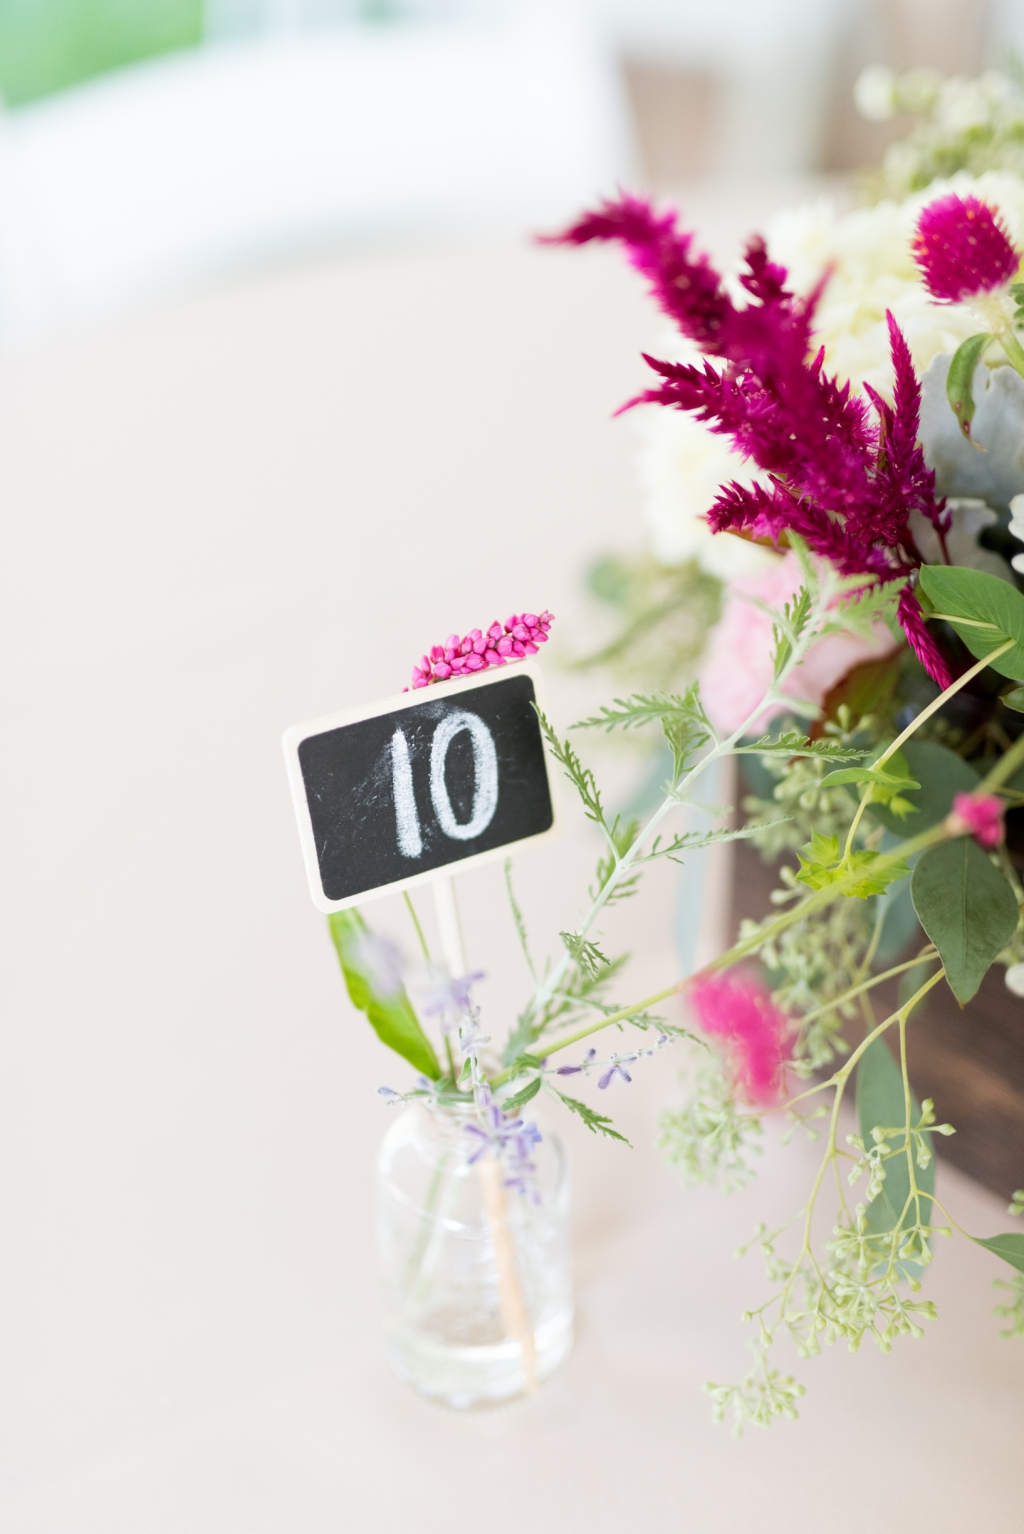 haley-richter-photography-buena-vista-confrence-center-wedding-summer-111